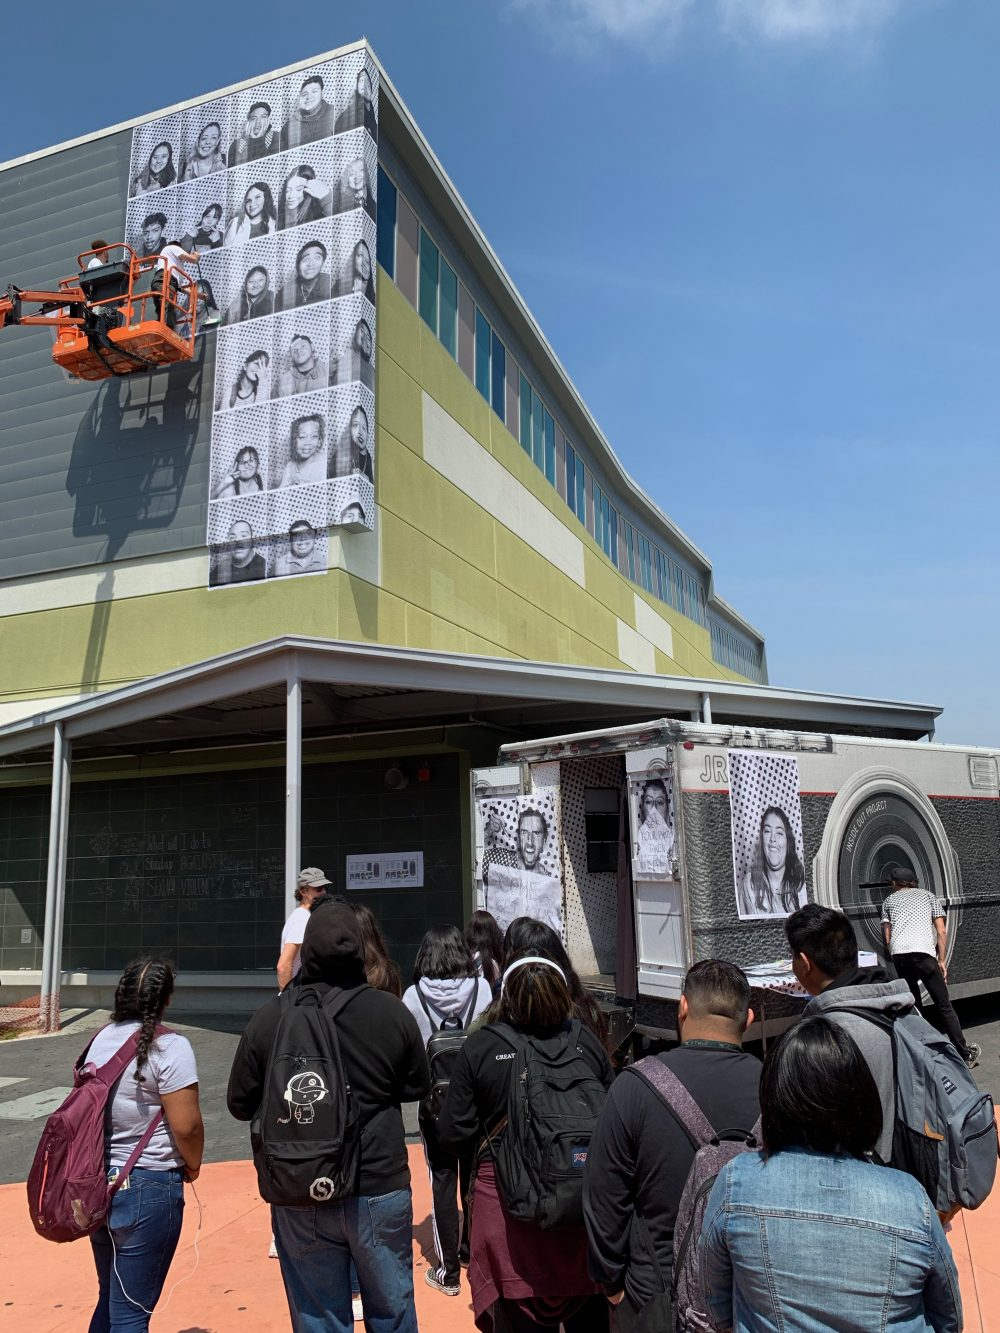 maya angelou mural festival